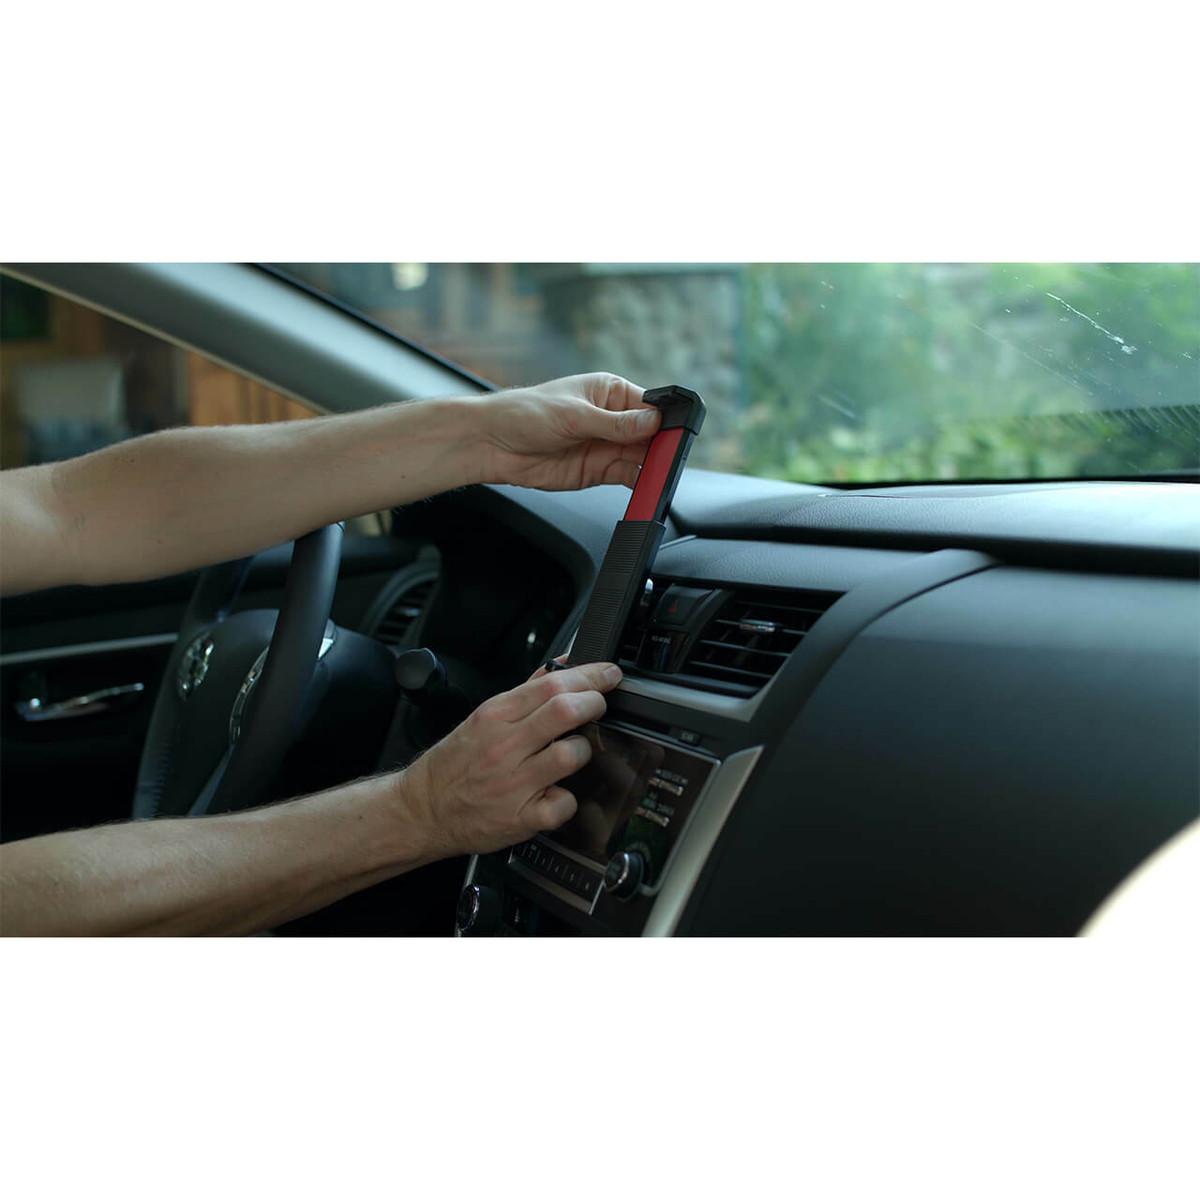 weBoost weBoost Drive Sleek 4G Cell Phone Signal Booster or 470135